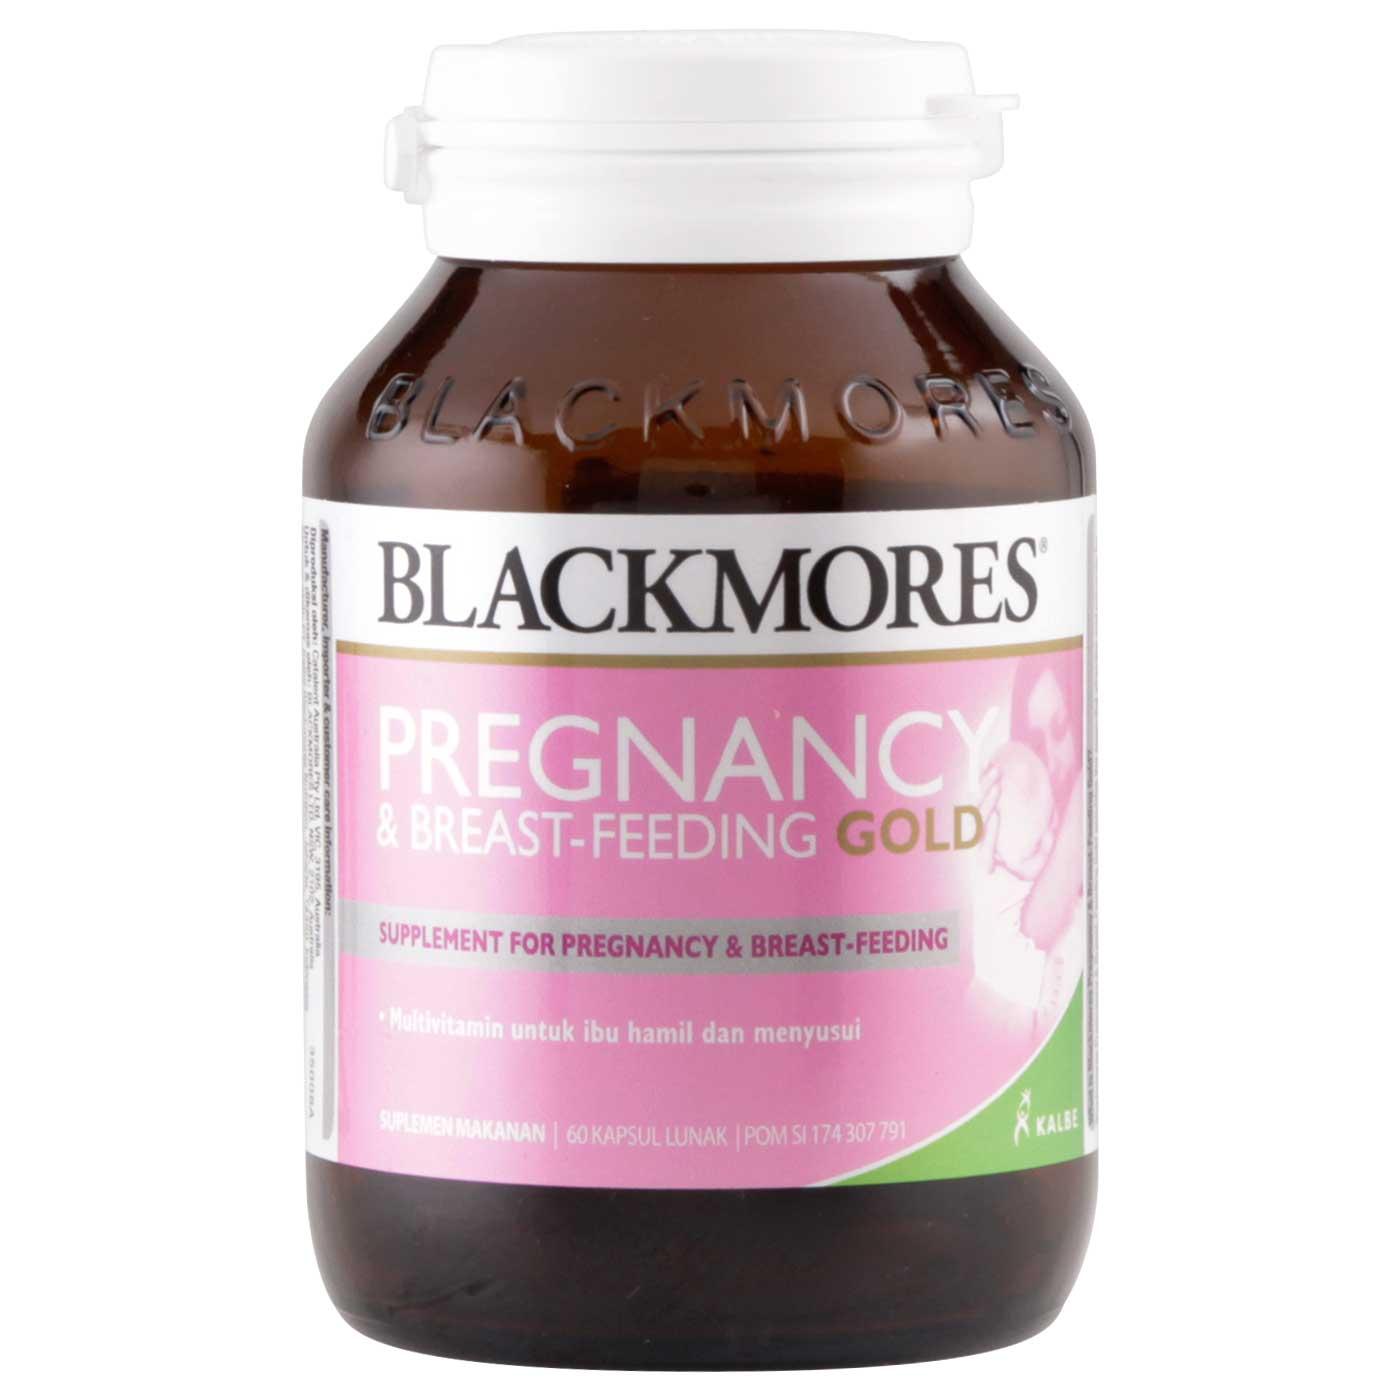 Blackmores Pregnancy & Breast-Feeding Gold (60 Tablet)